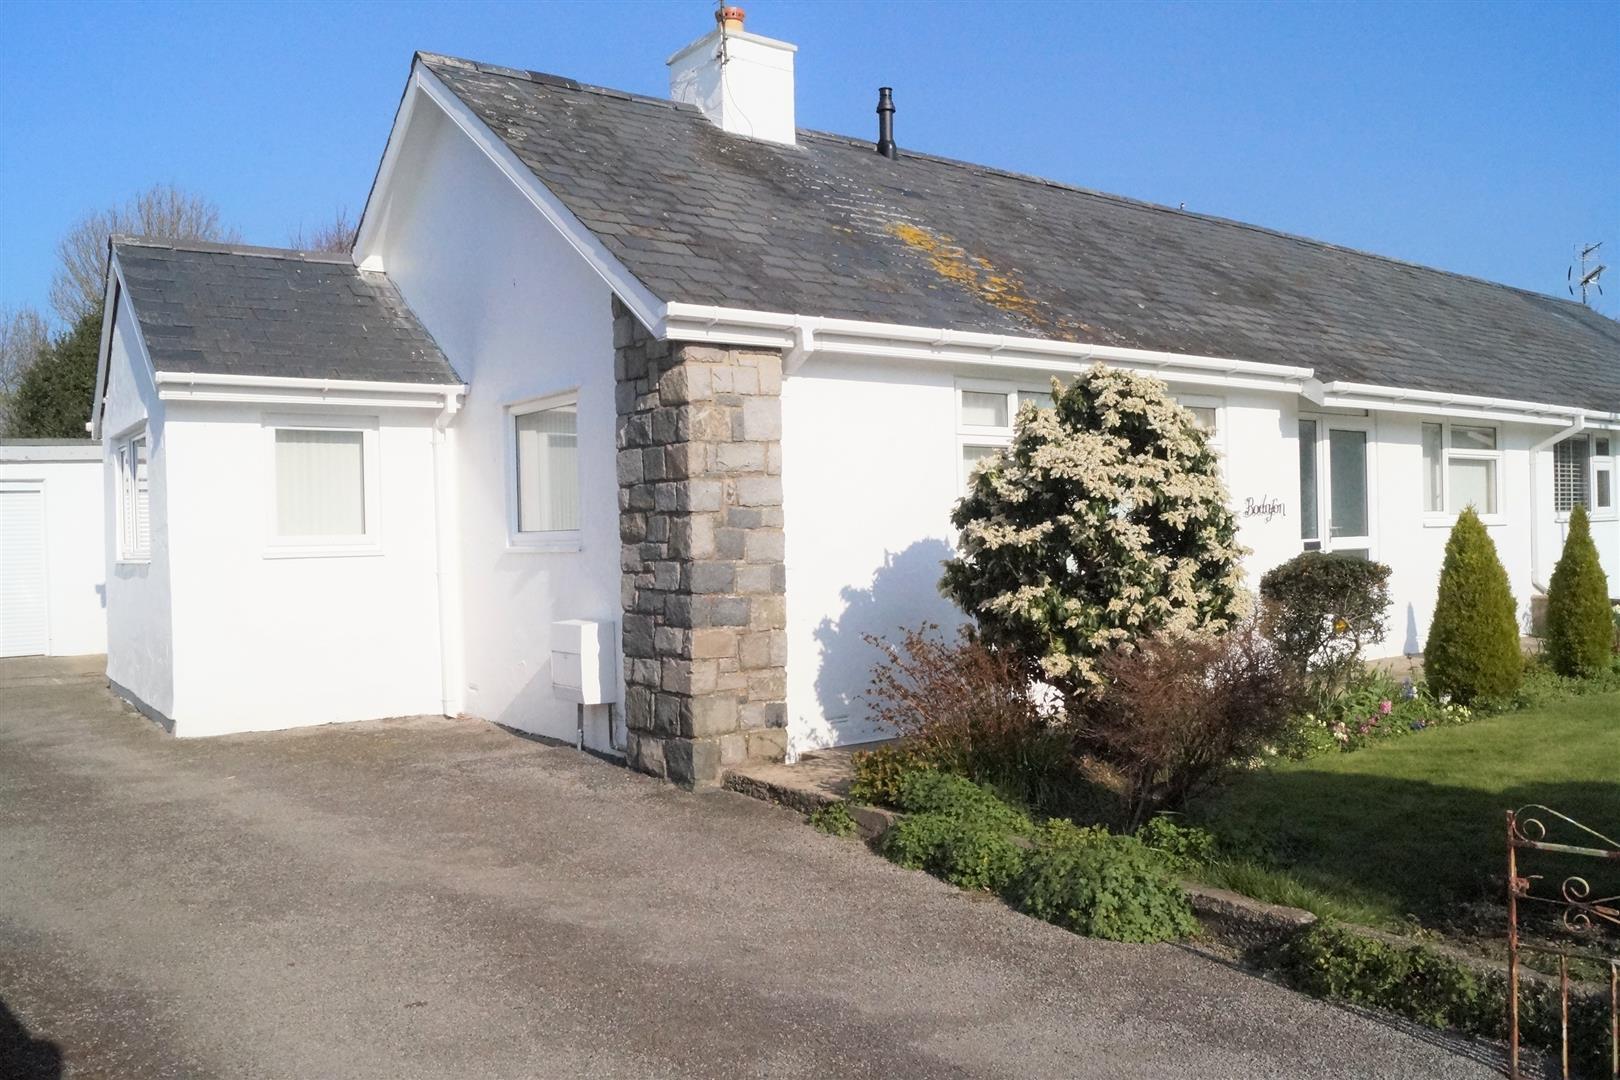 Glanerch, Abererch, Pwllheli - £180,000/Reduced to